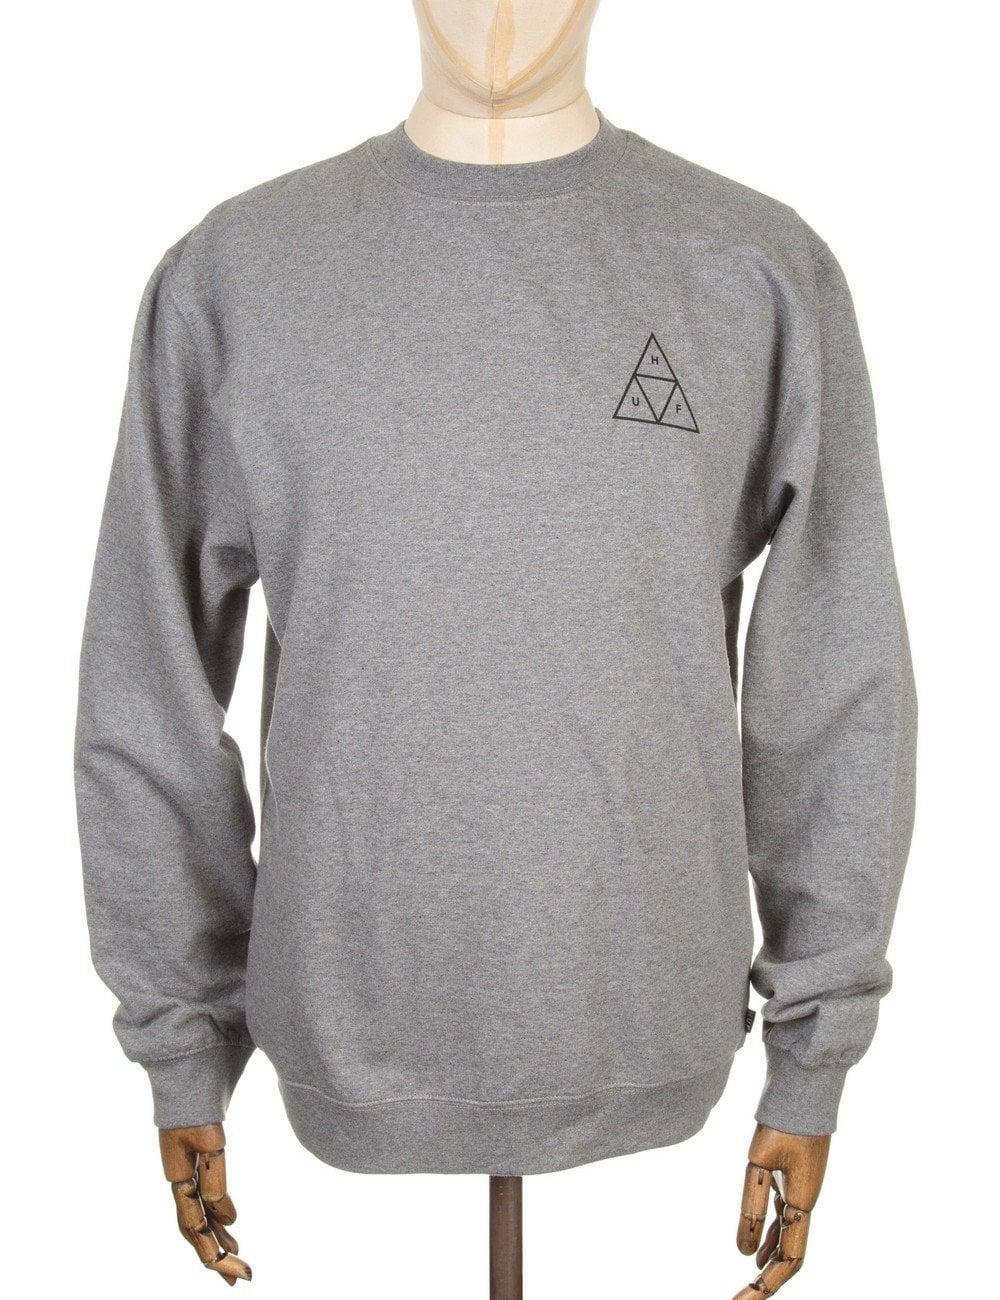 4c2e15fe0e6de Huf Triple Triangle Sweatshirt - Heather Grey - Clothing from Fat ...